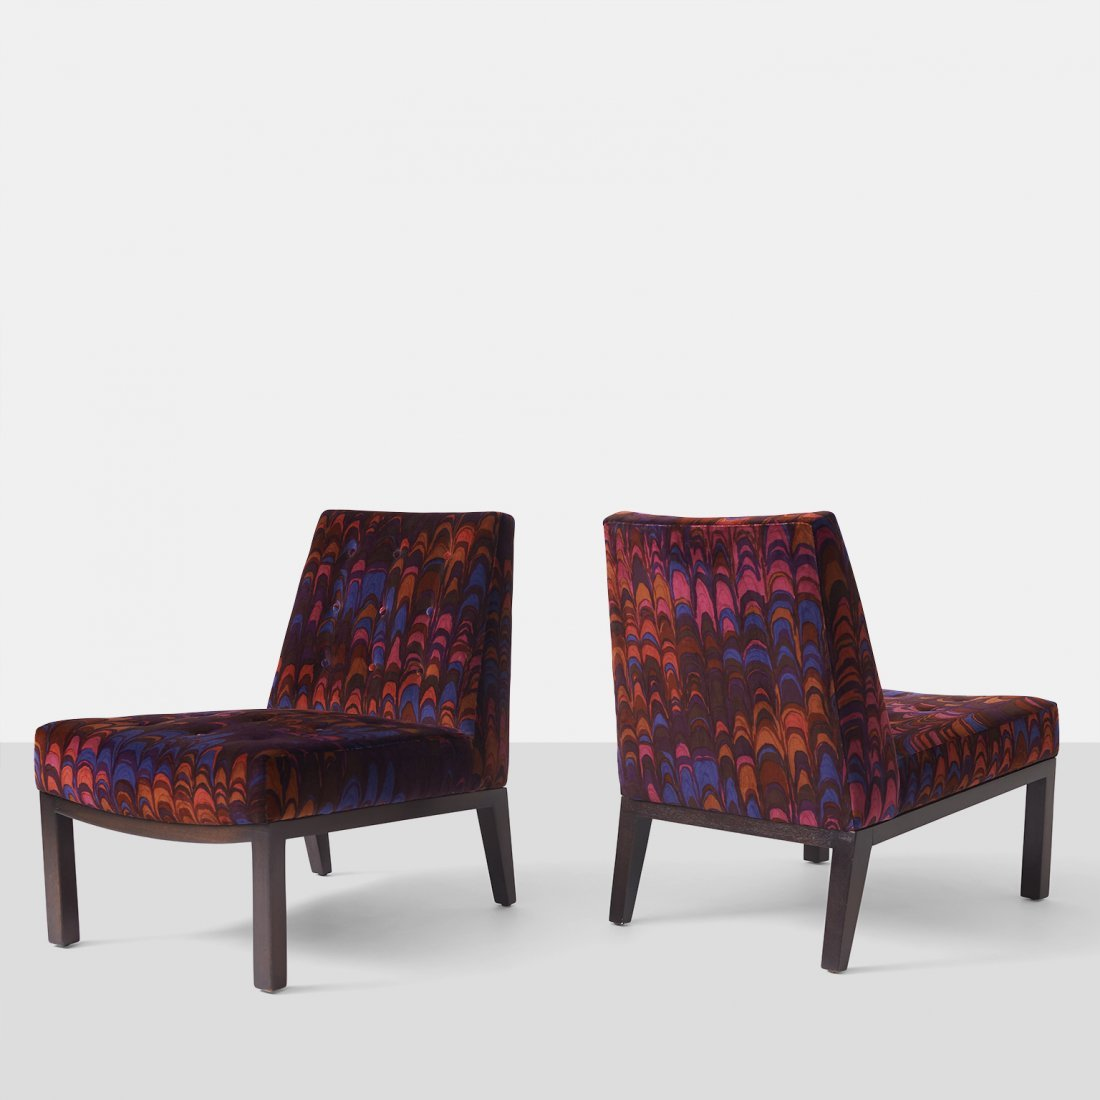 Edward Wormley for Dunbar, Slipper Chairs with original